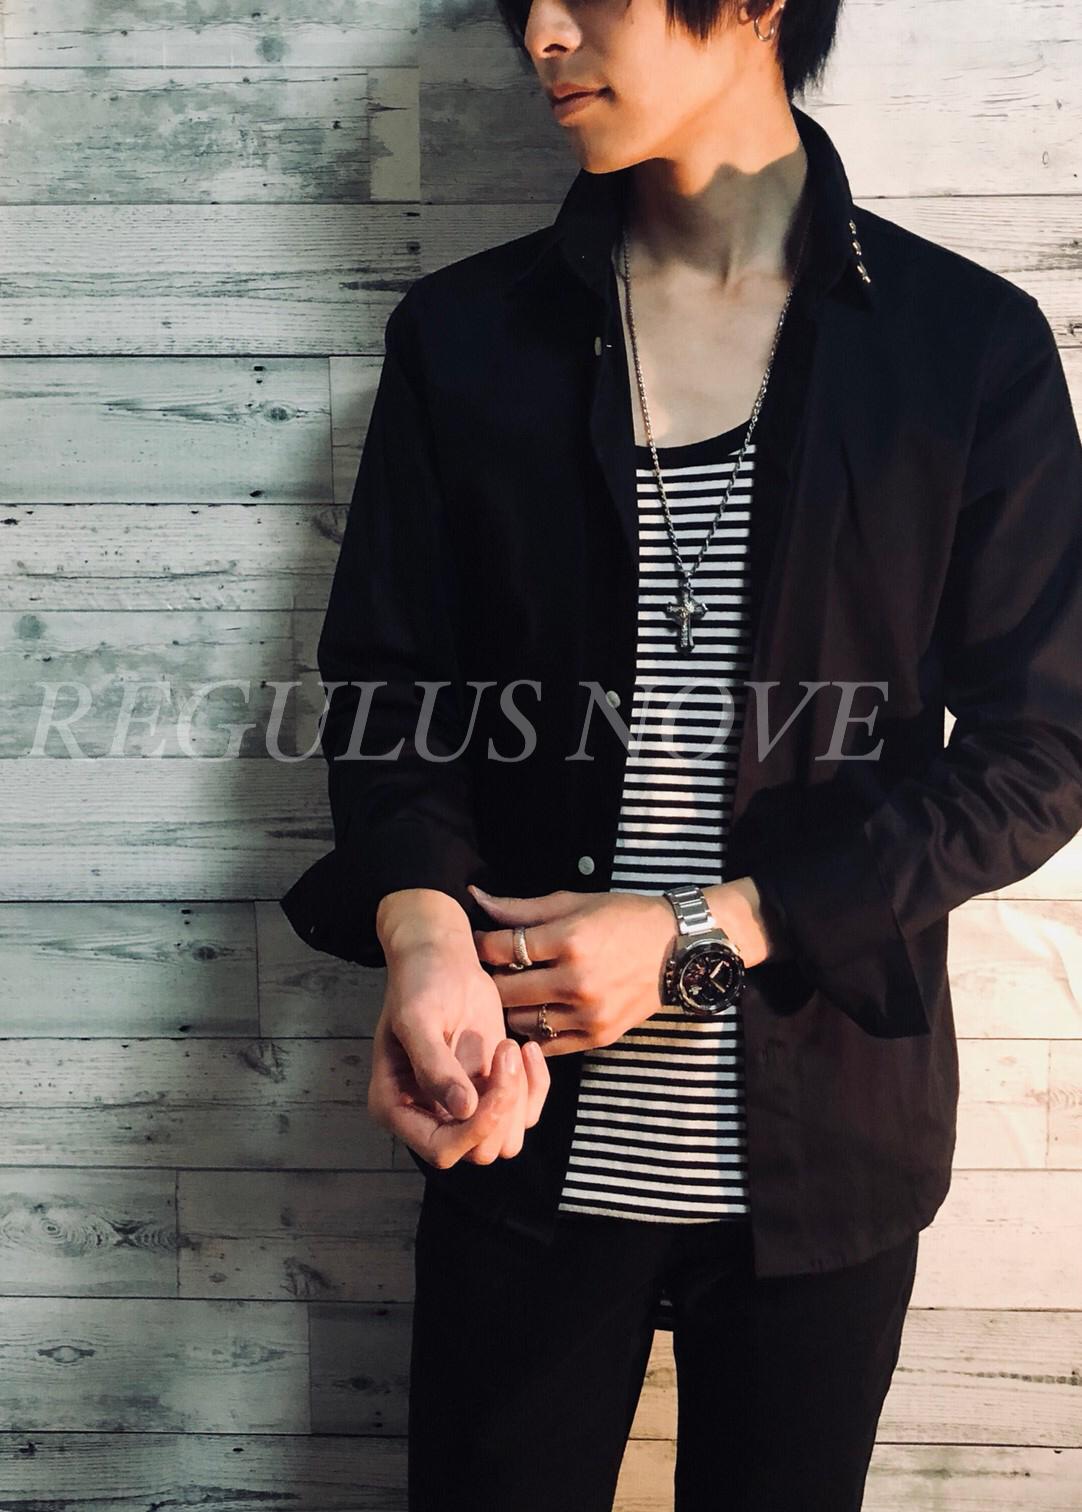 REGULUS NOVE ポイントスターストレッチブロードシャツ   BLACK メンズ 男物 紳士服 細身 フォーマル カジュアル 星 スタッズ トップス